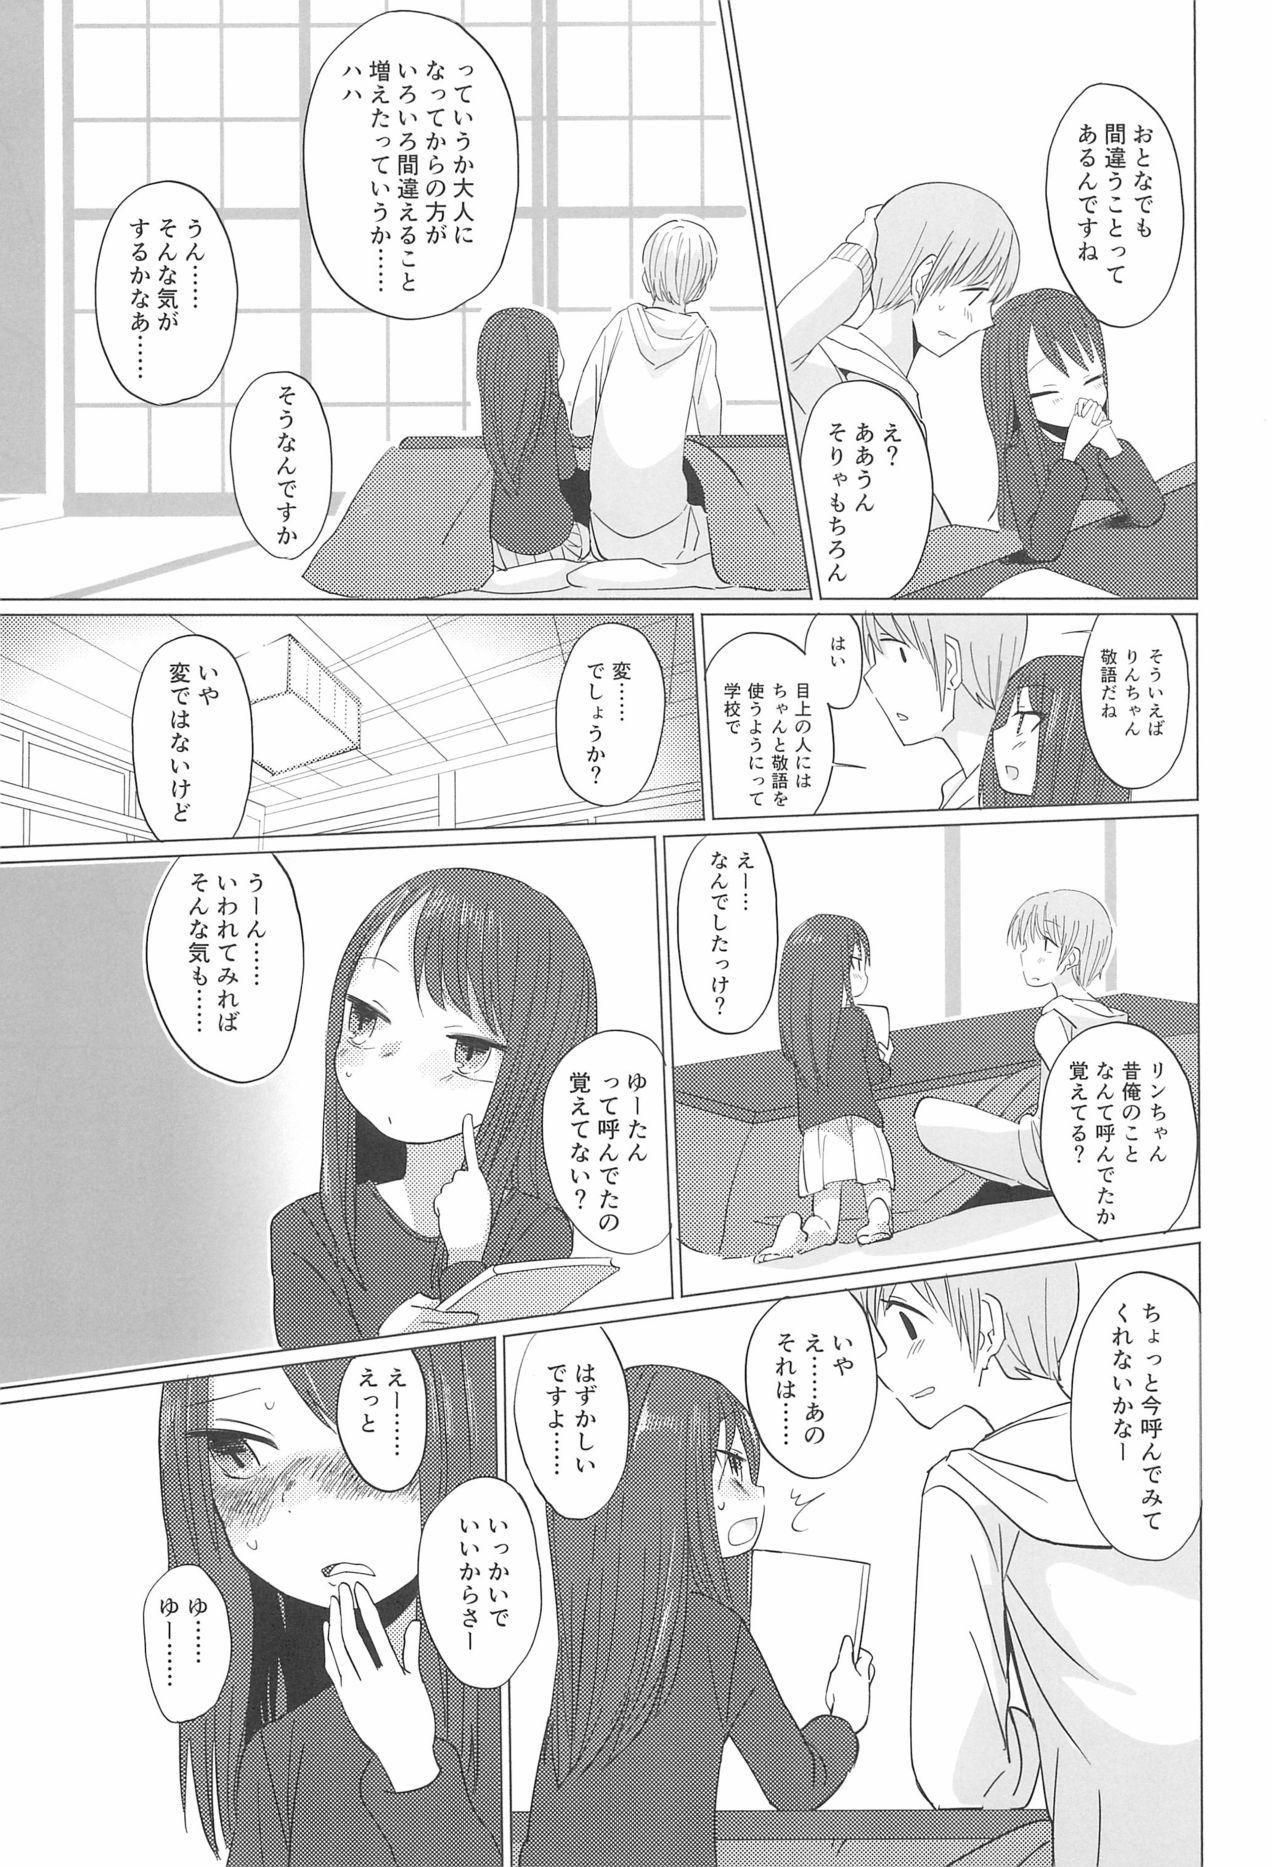 Fuyu wa Inaka ni Kaerou. 4